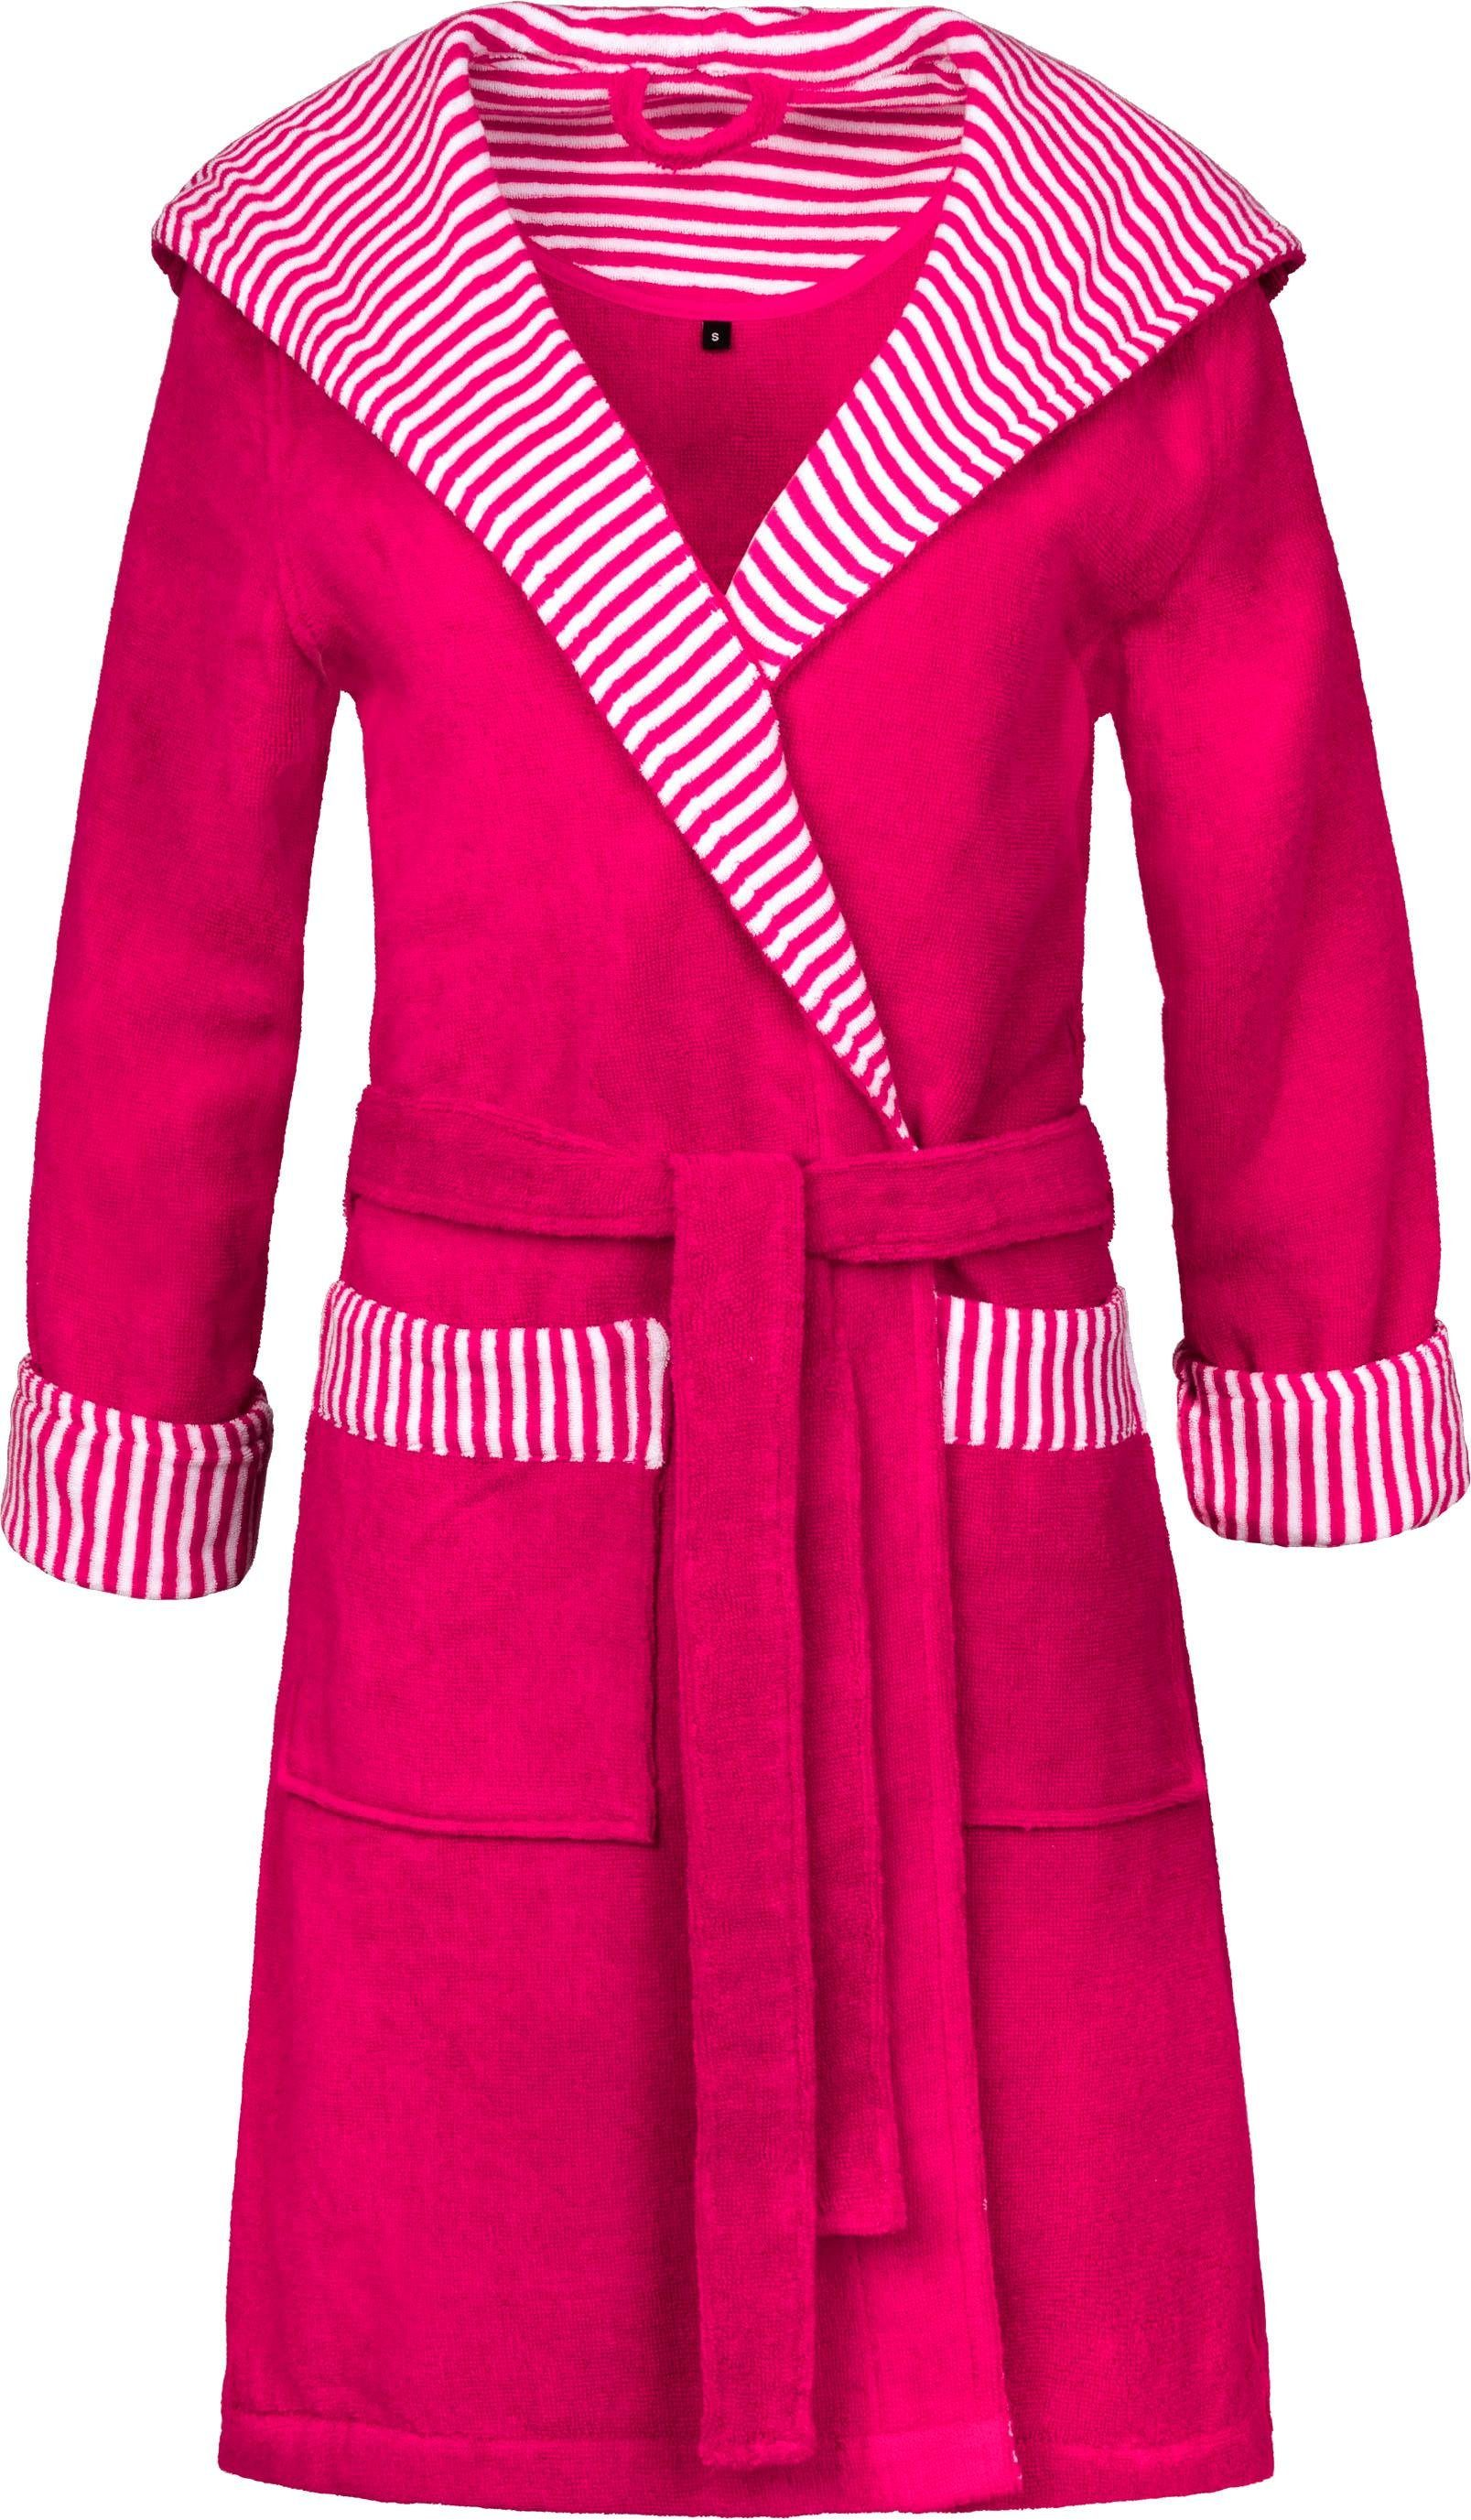 Damenbademantel Day Esprit | Bekleidung > Bademode > Bademäntel | Rot | Esprit